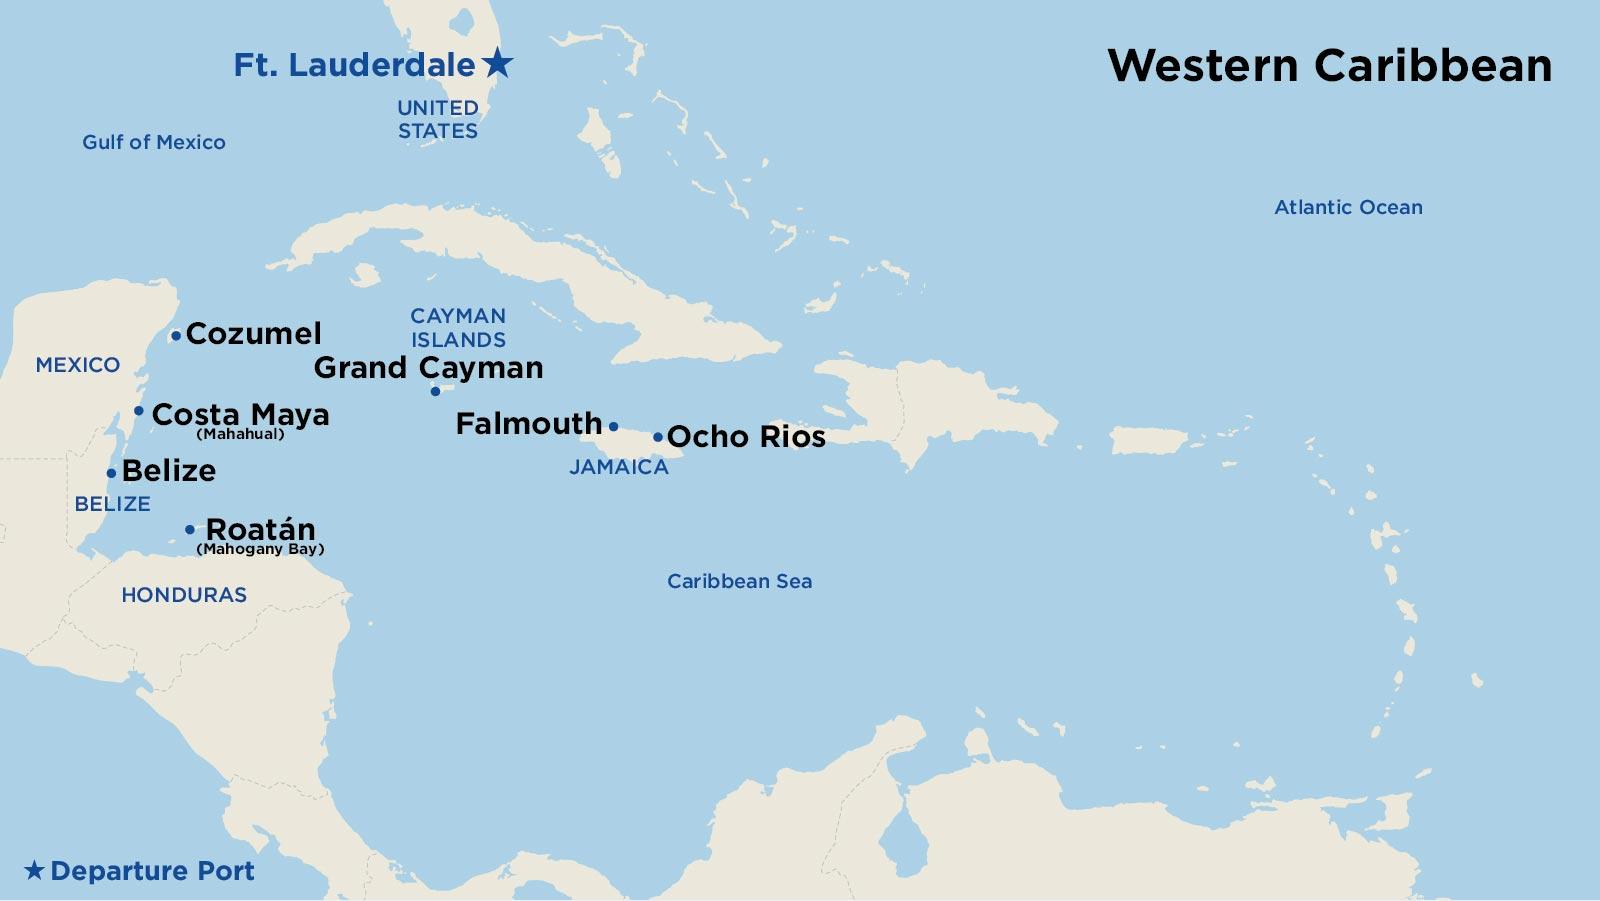 Western Caribbean Cruises - Cruise to Grand Cayman, Cozumel ...